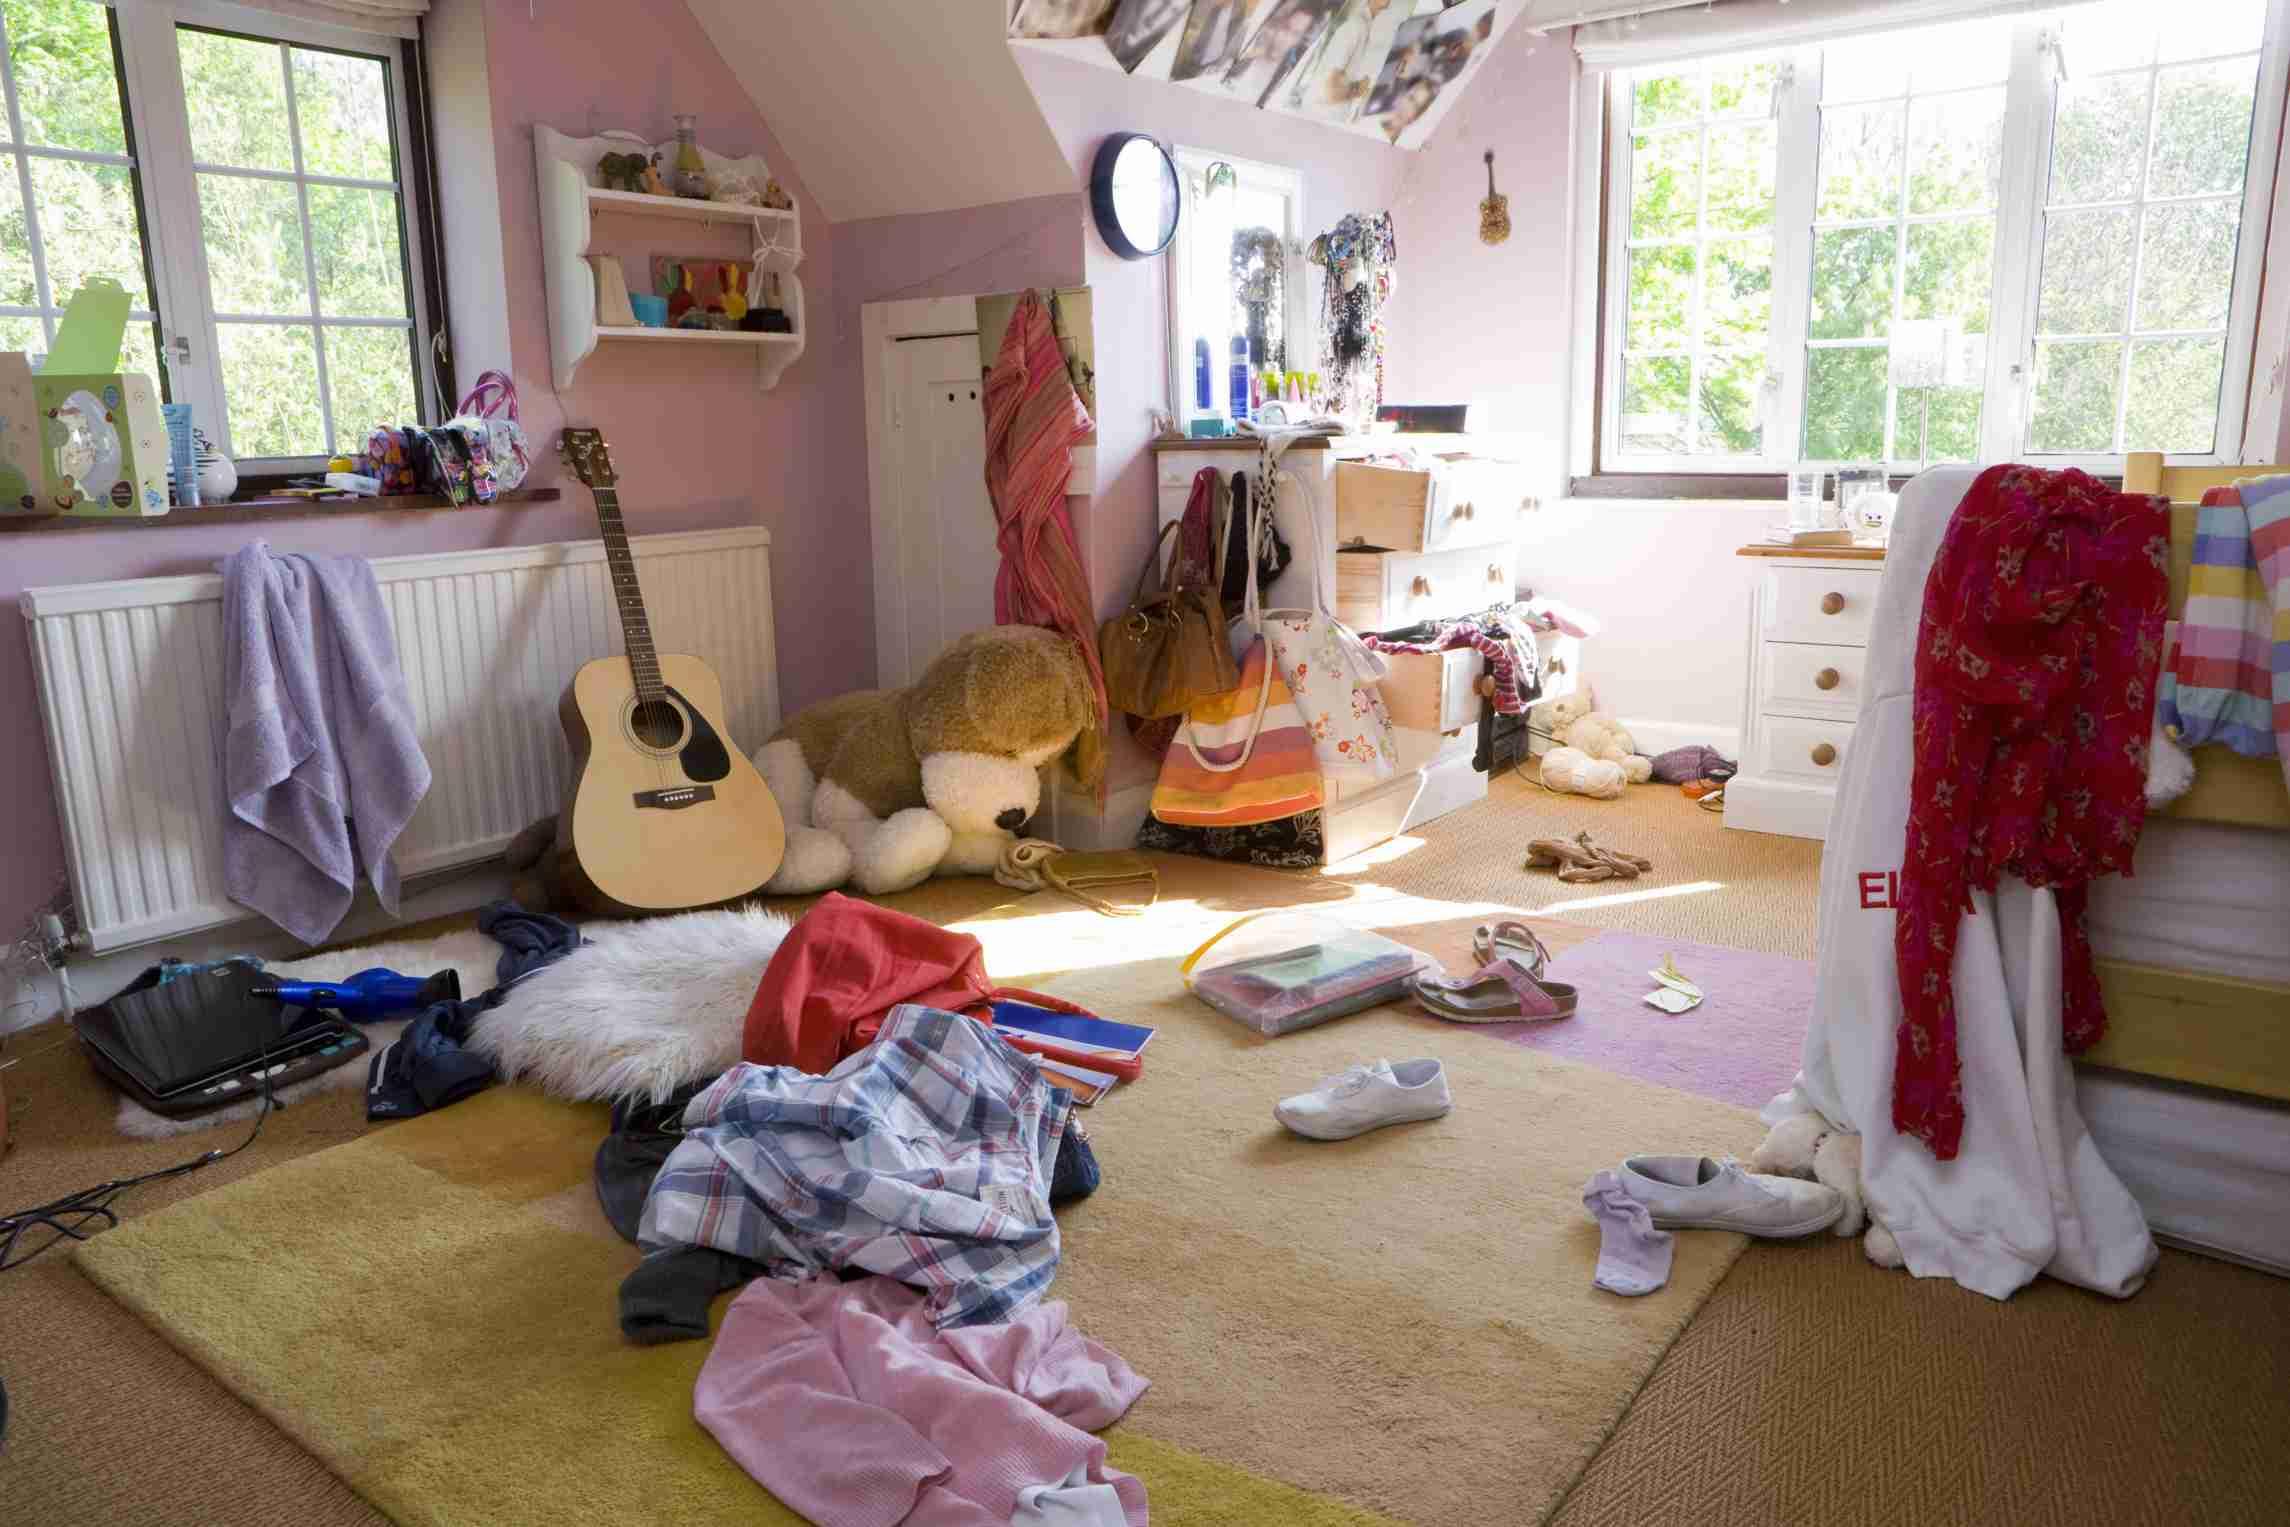 Clutter in a bedroom